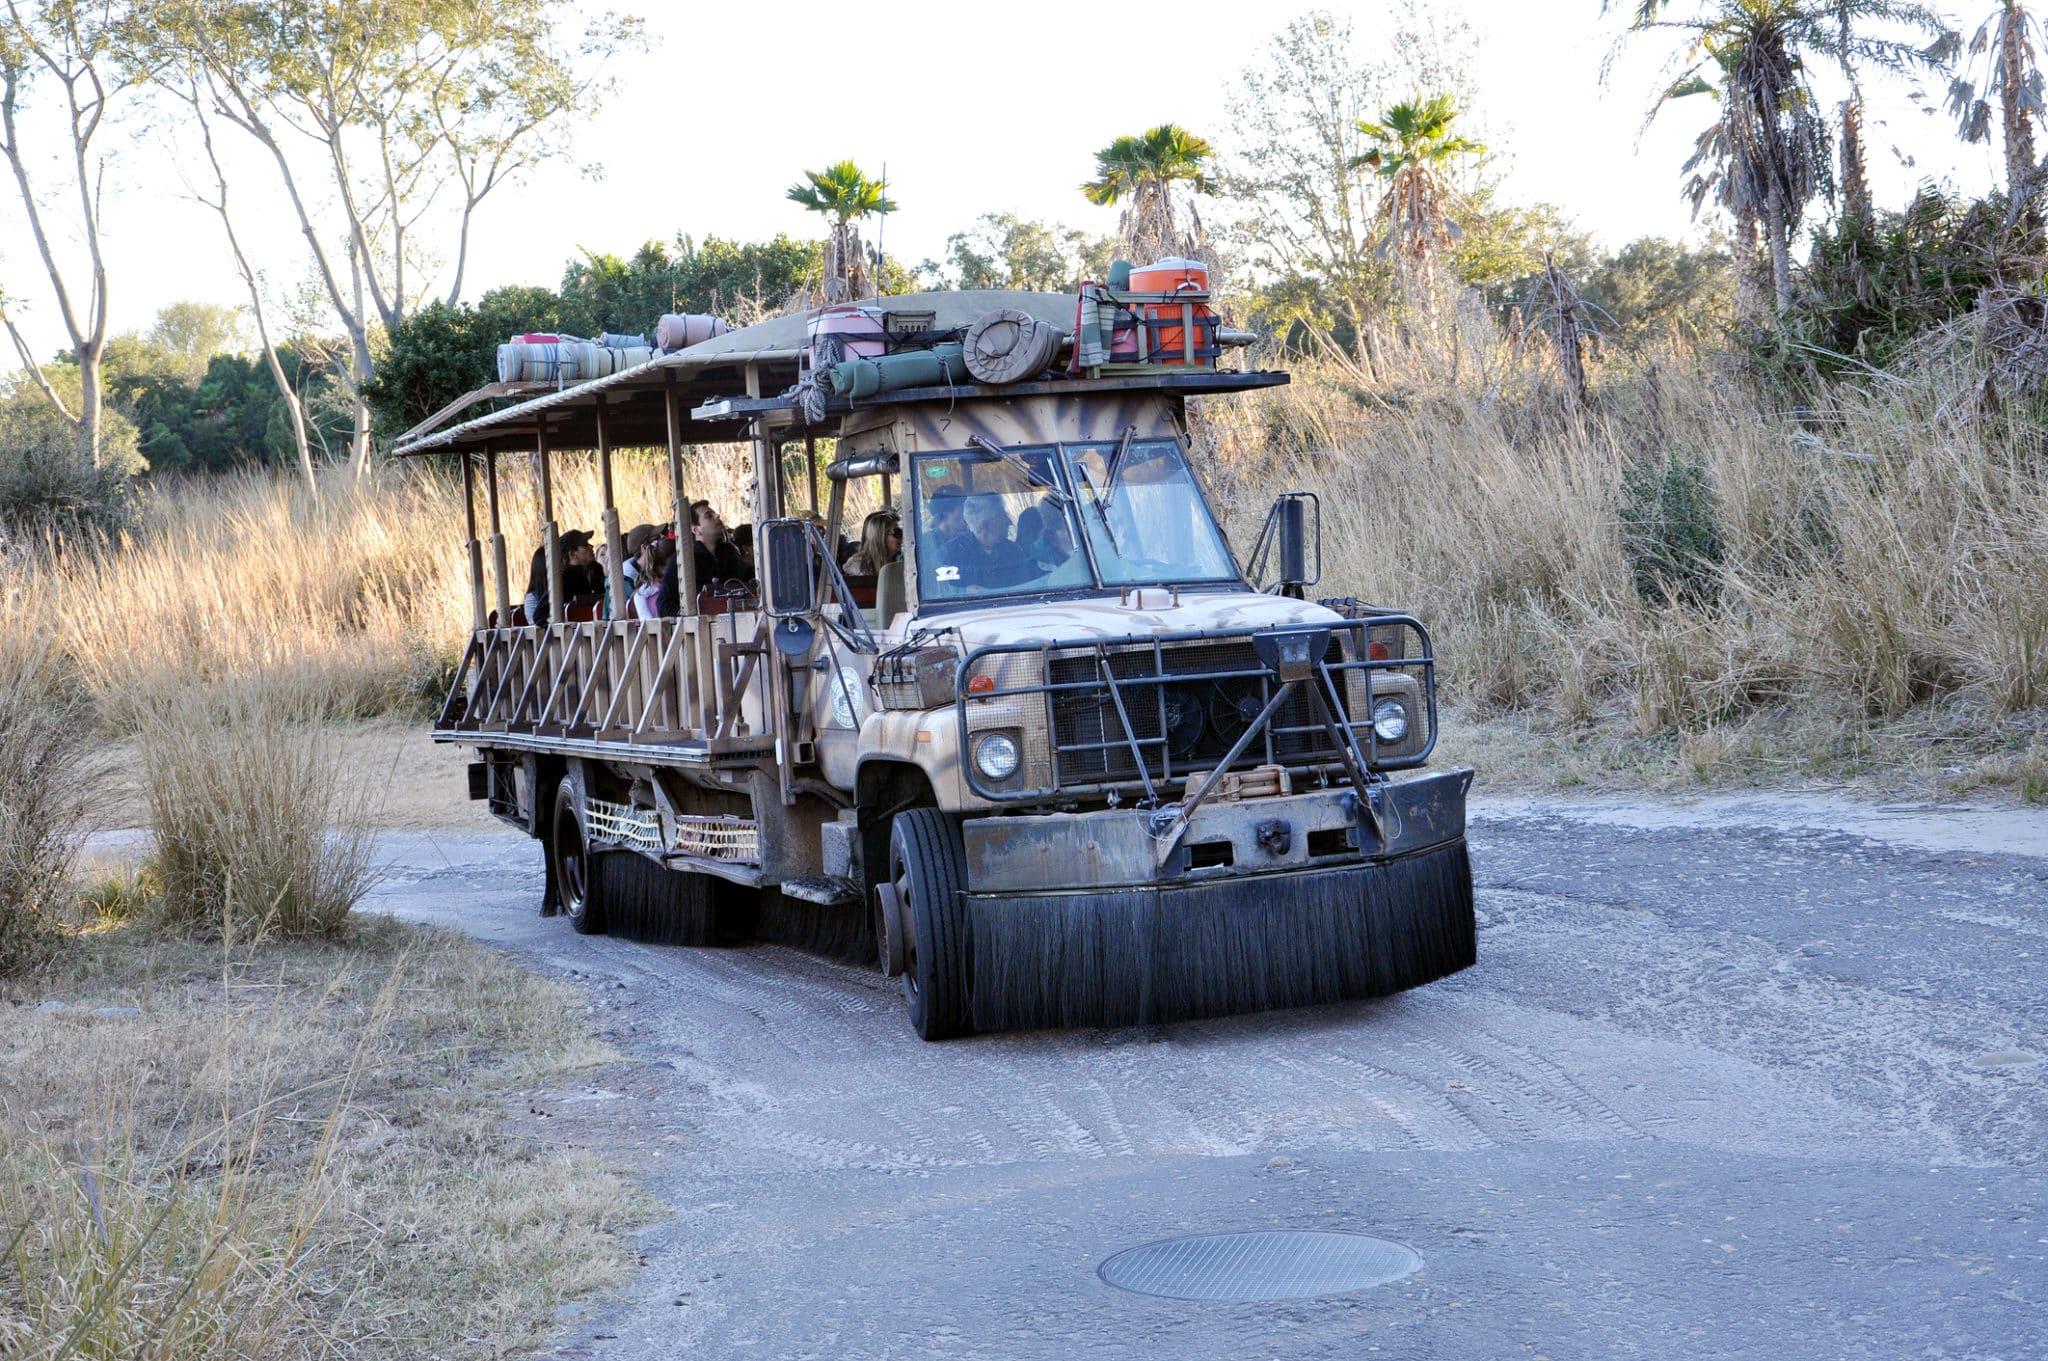 kilimanjaro ride at animal kingdom